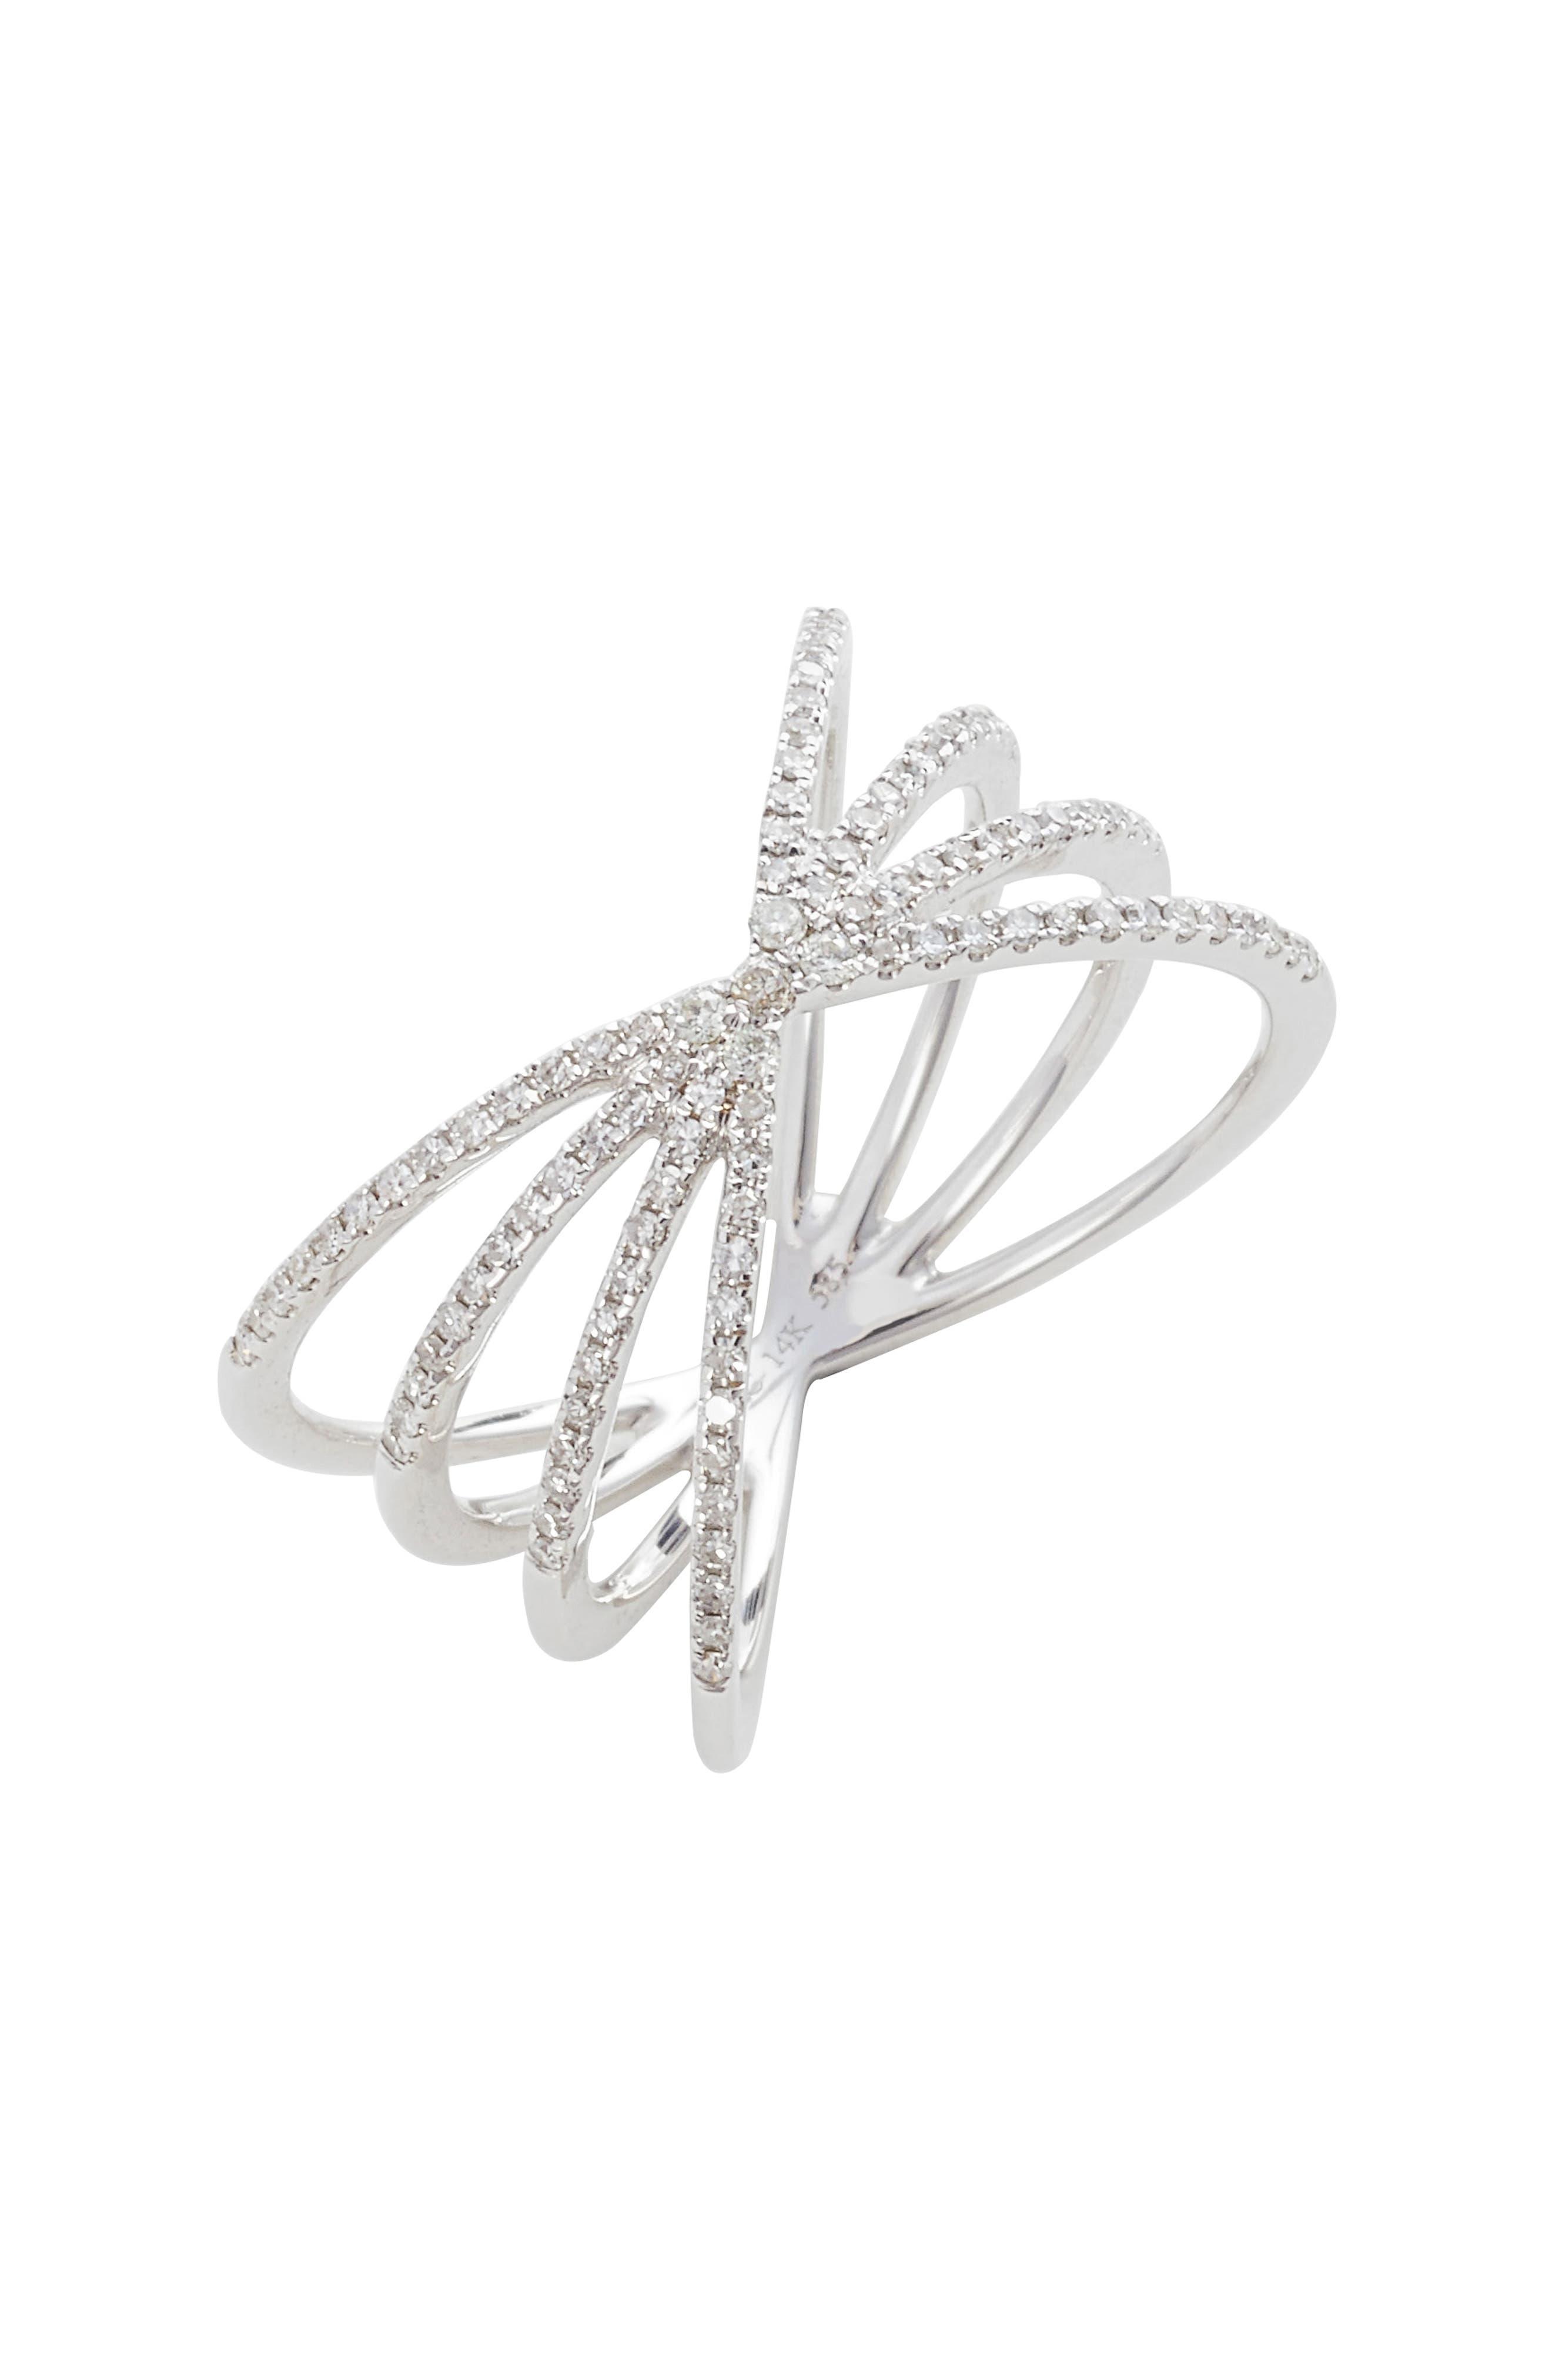 EF COLLECTION Sunburst Diamond Ring